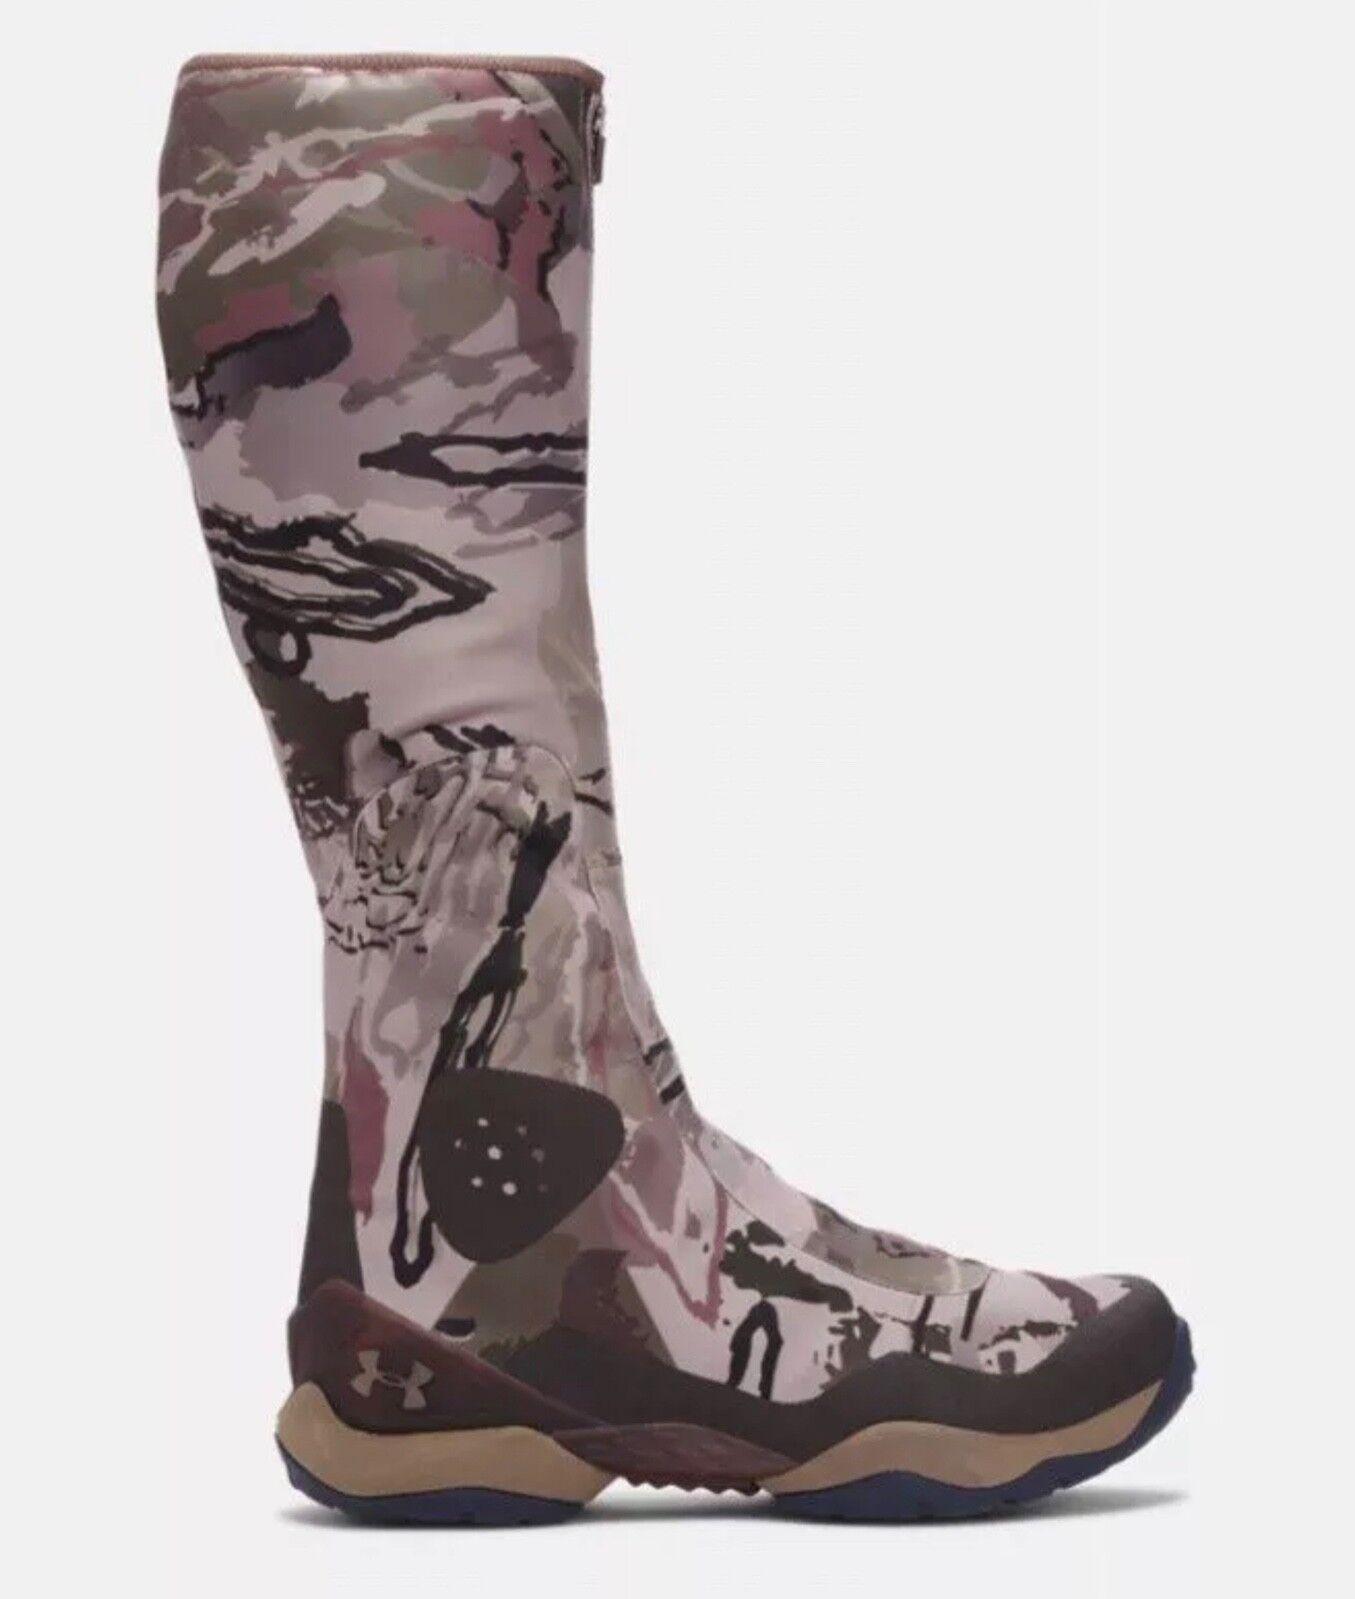 Under Armour Armour Armour Ops Hunter Ridge Reaper Barren Waterproof Men's Stiefel 1262052-900 d891a3